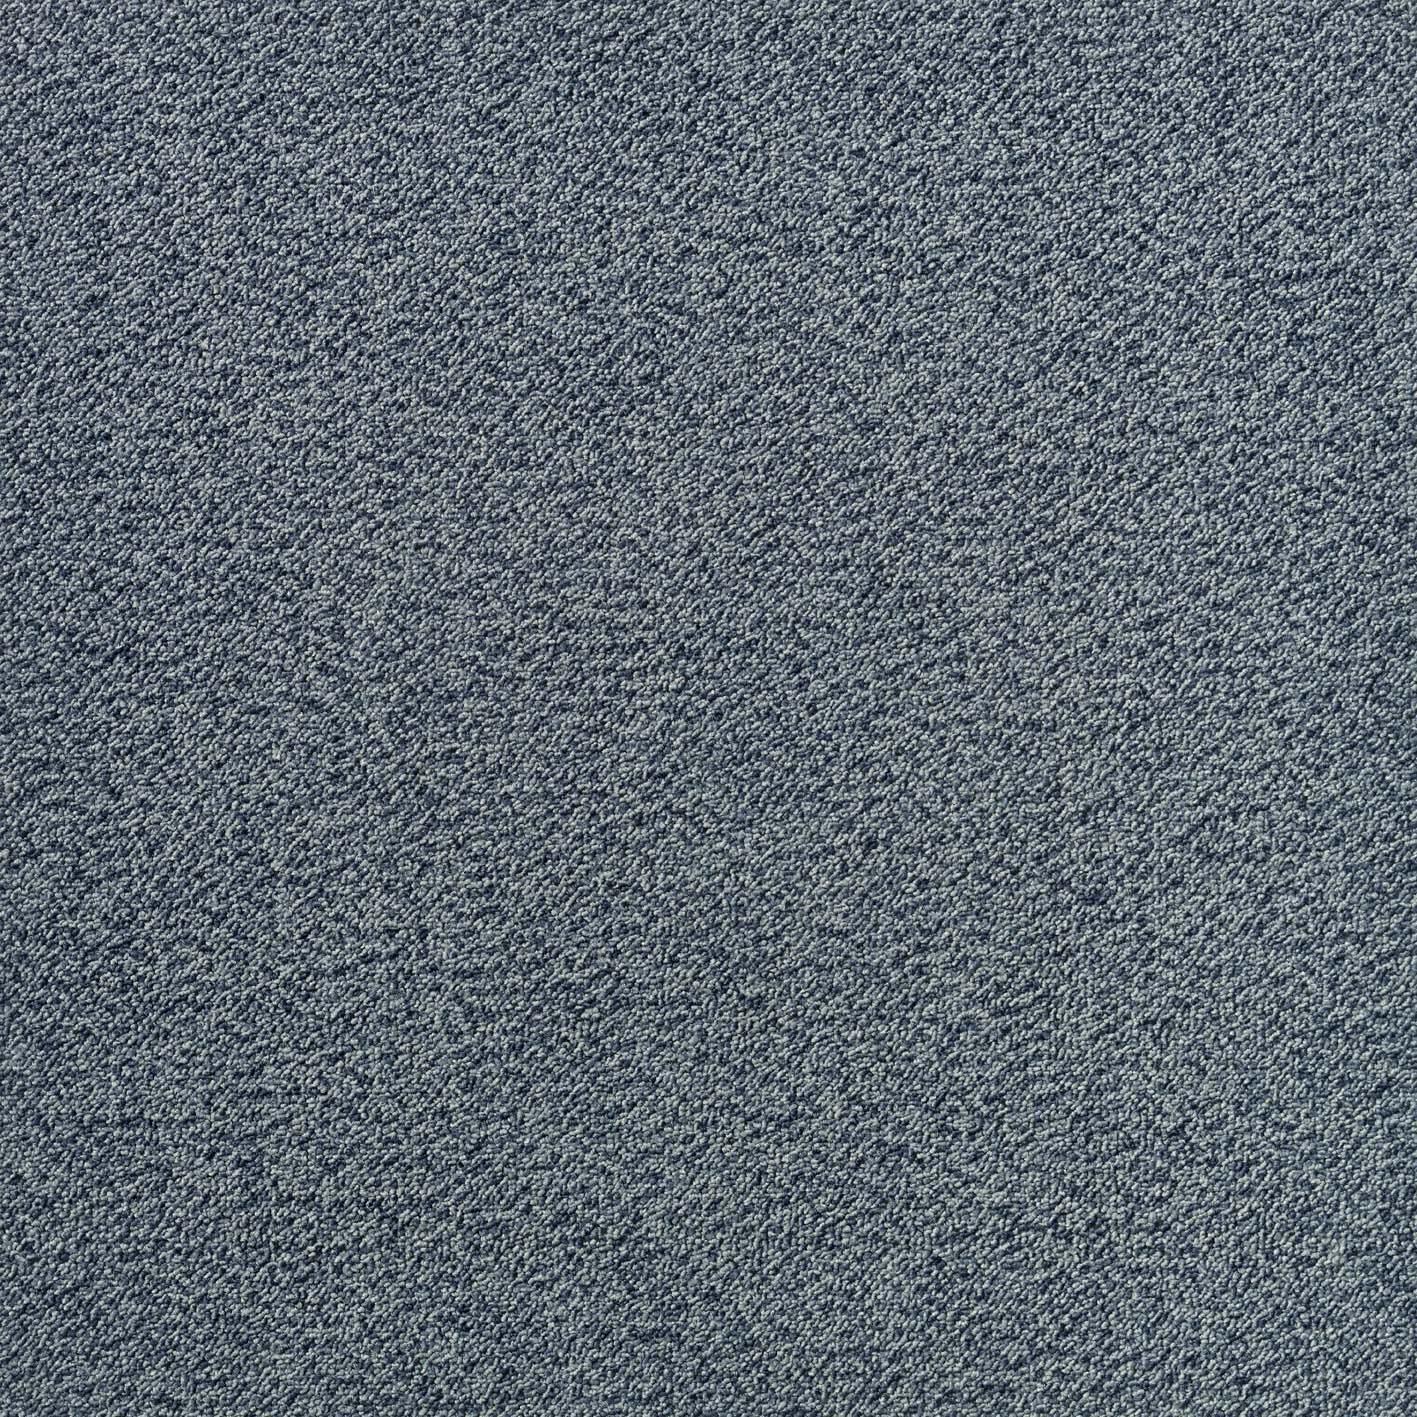 Ковровая плитка Domo Base 506